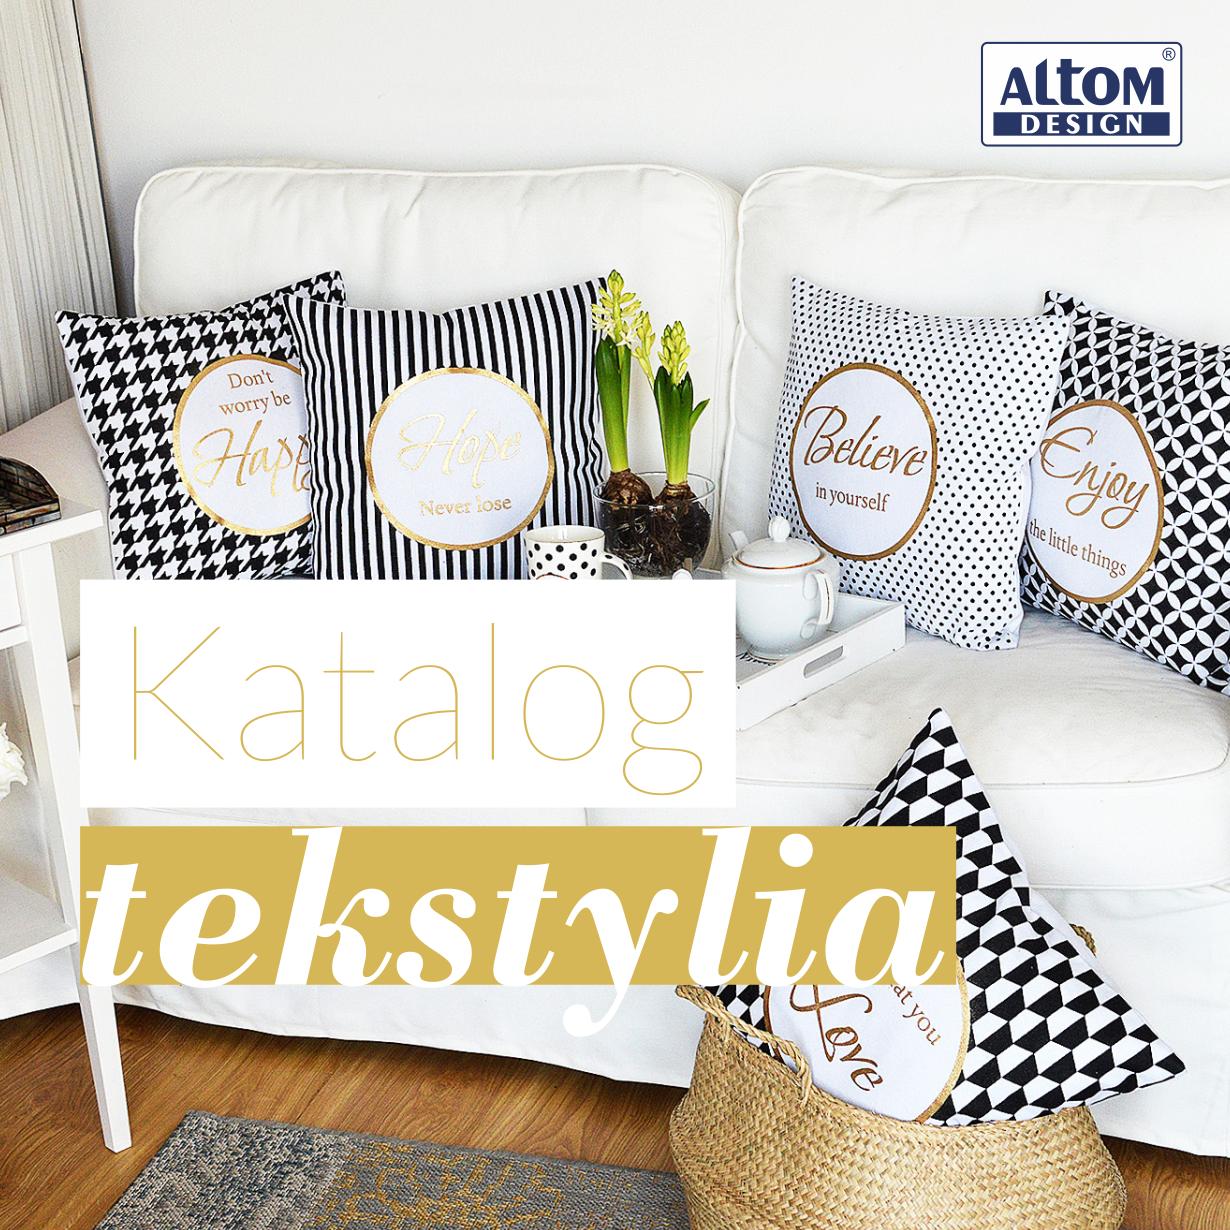 Katalog_tekstylia_altom_design_1.jpg